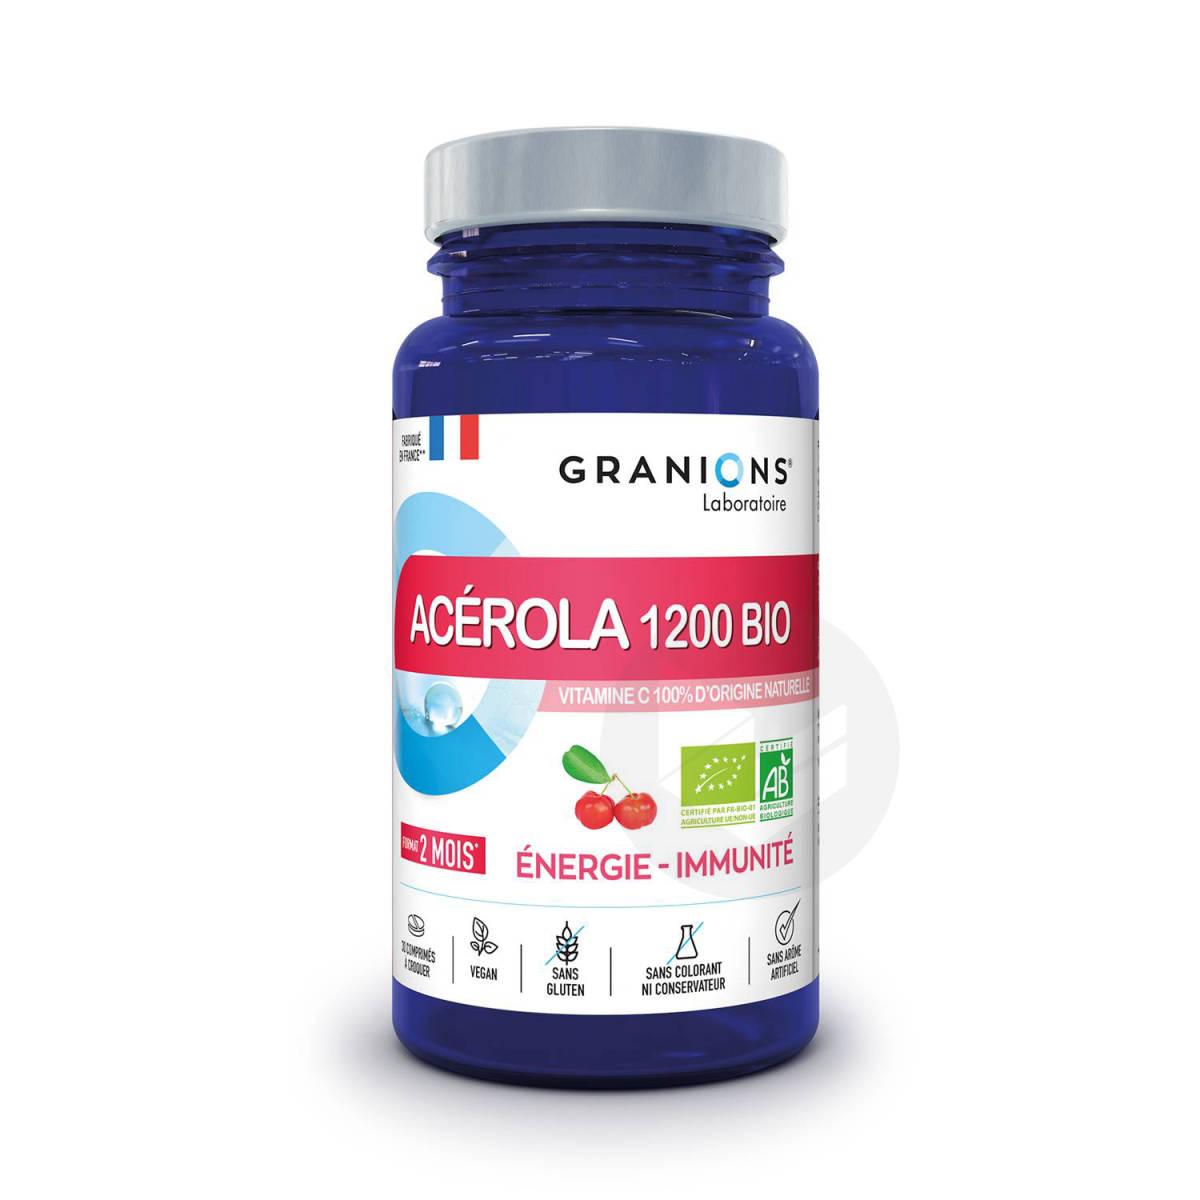 Acerola 1200 Bio Energie Immunite 30 Comprimes A Croquer